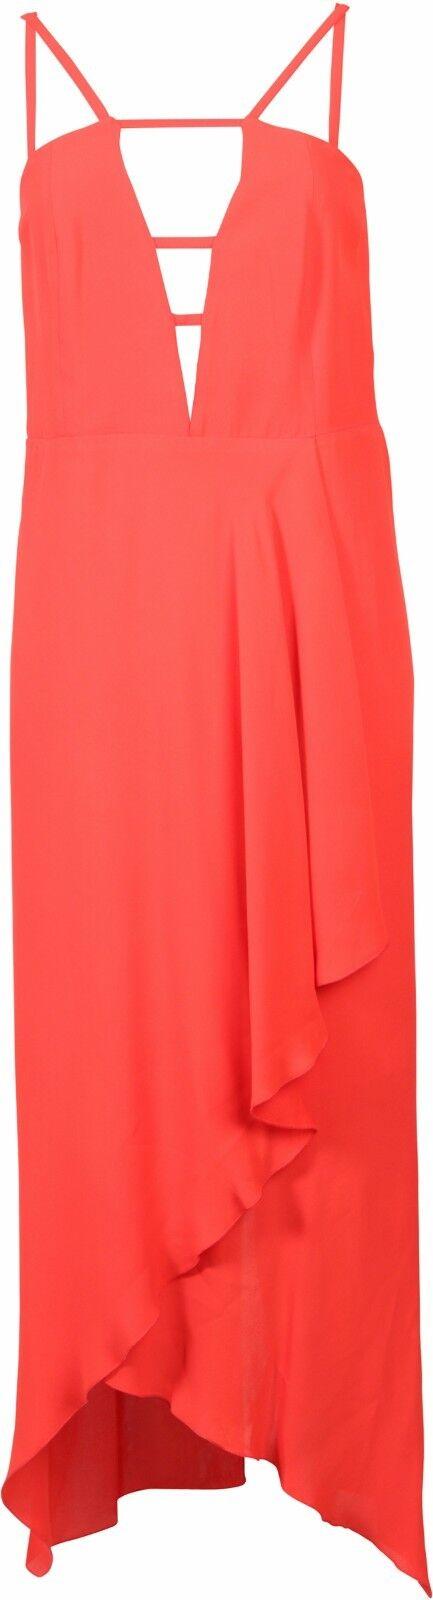 LALA BERLIN Strap Kleid Bojana red Volants Lang Gr M NEU 67924